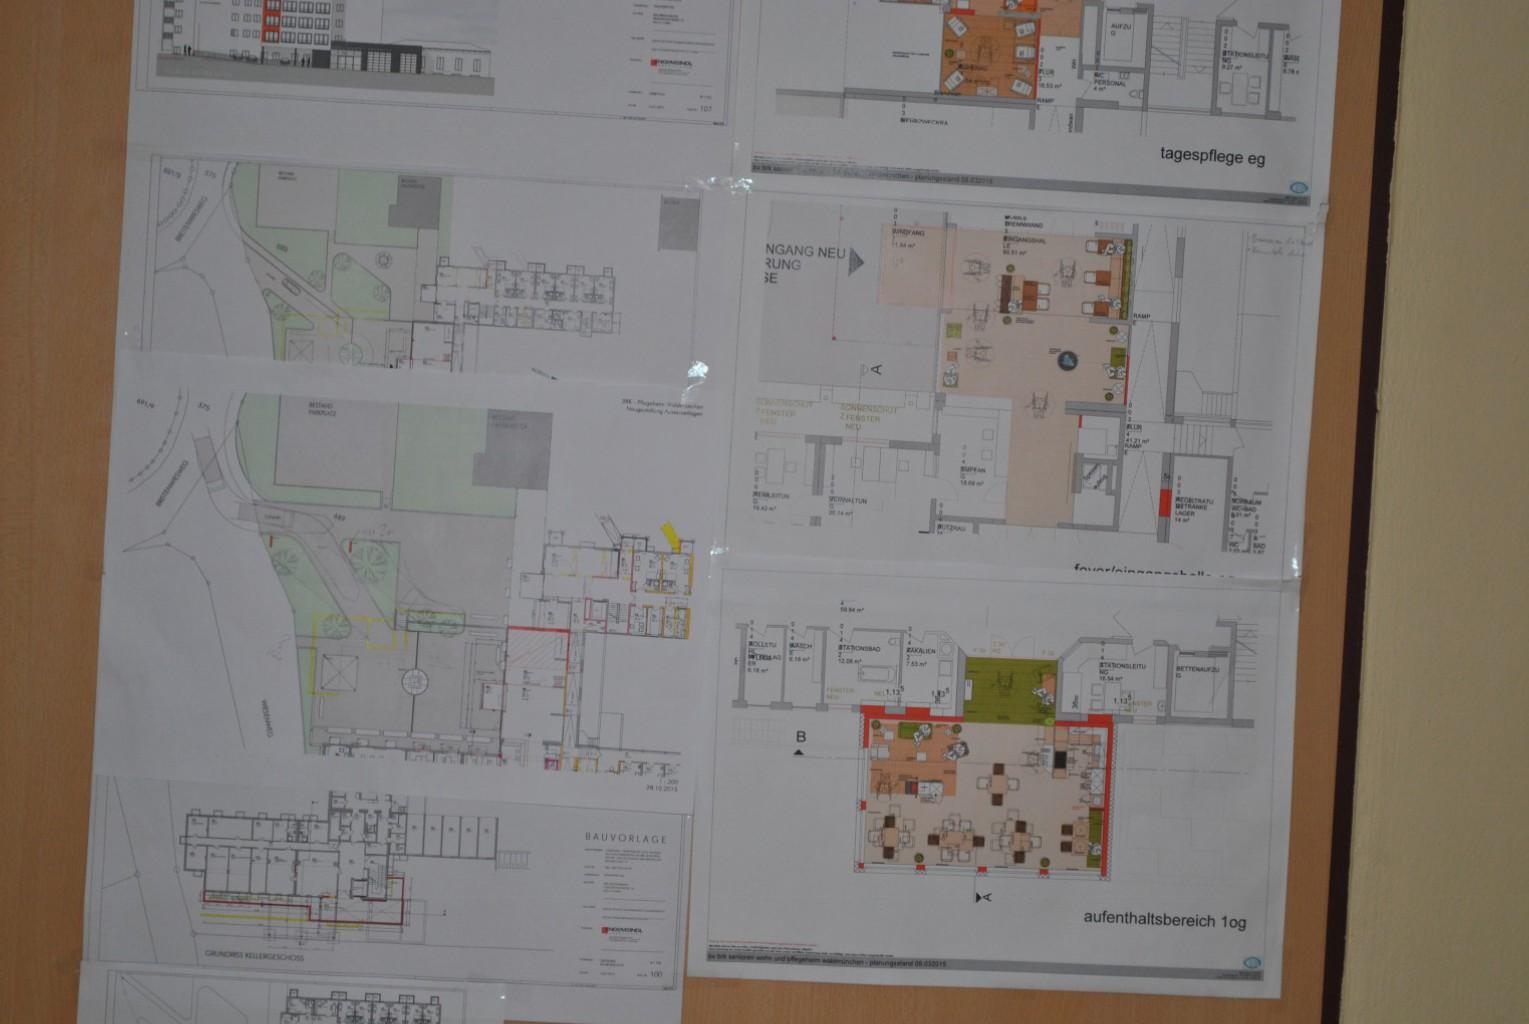 Umbau Des Seniorenheims Beginnt Im Frühjahr